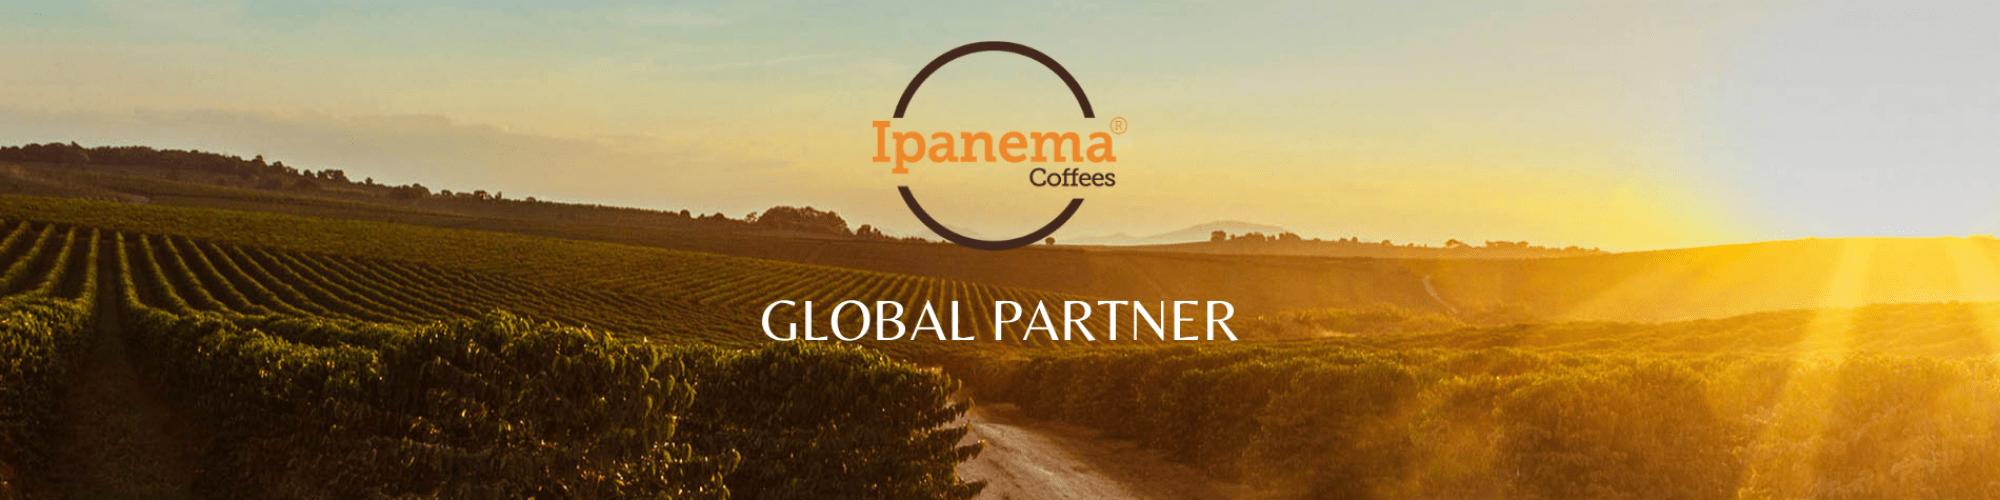 fresh ocs partner global ipanema coffees